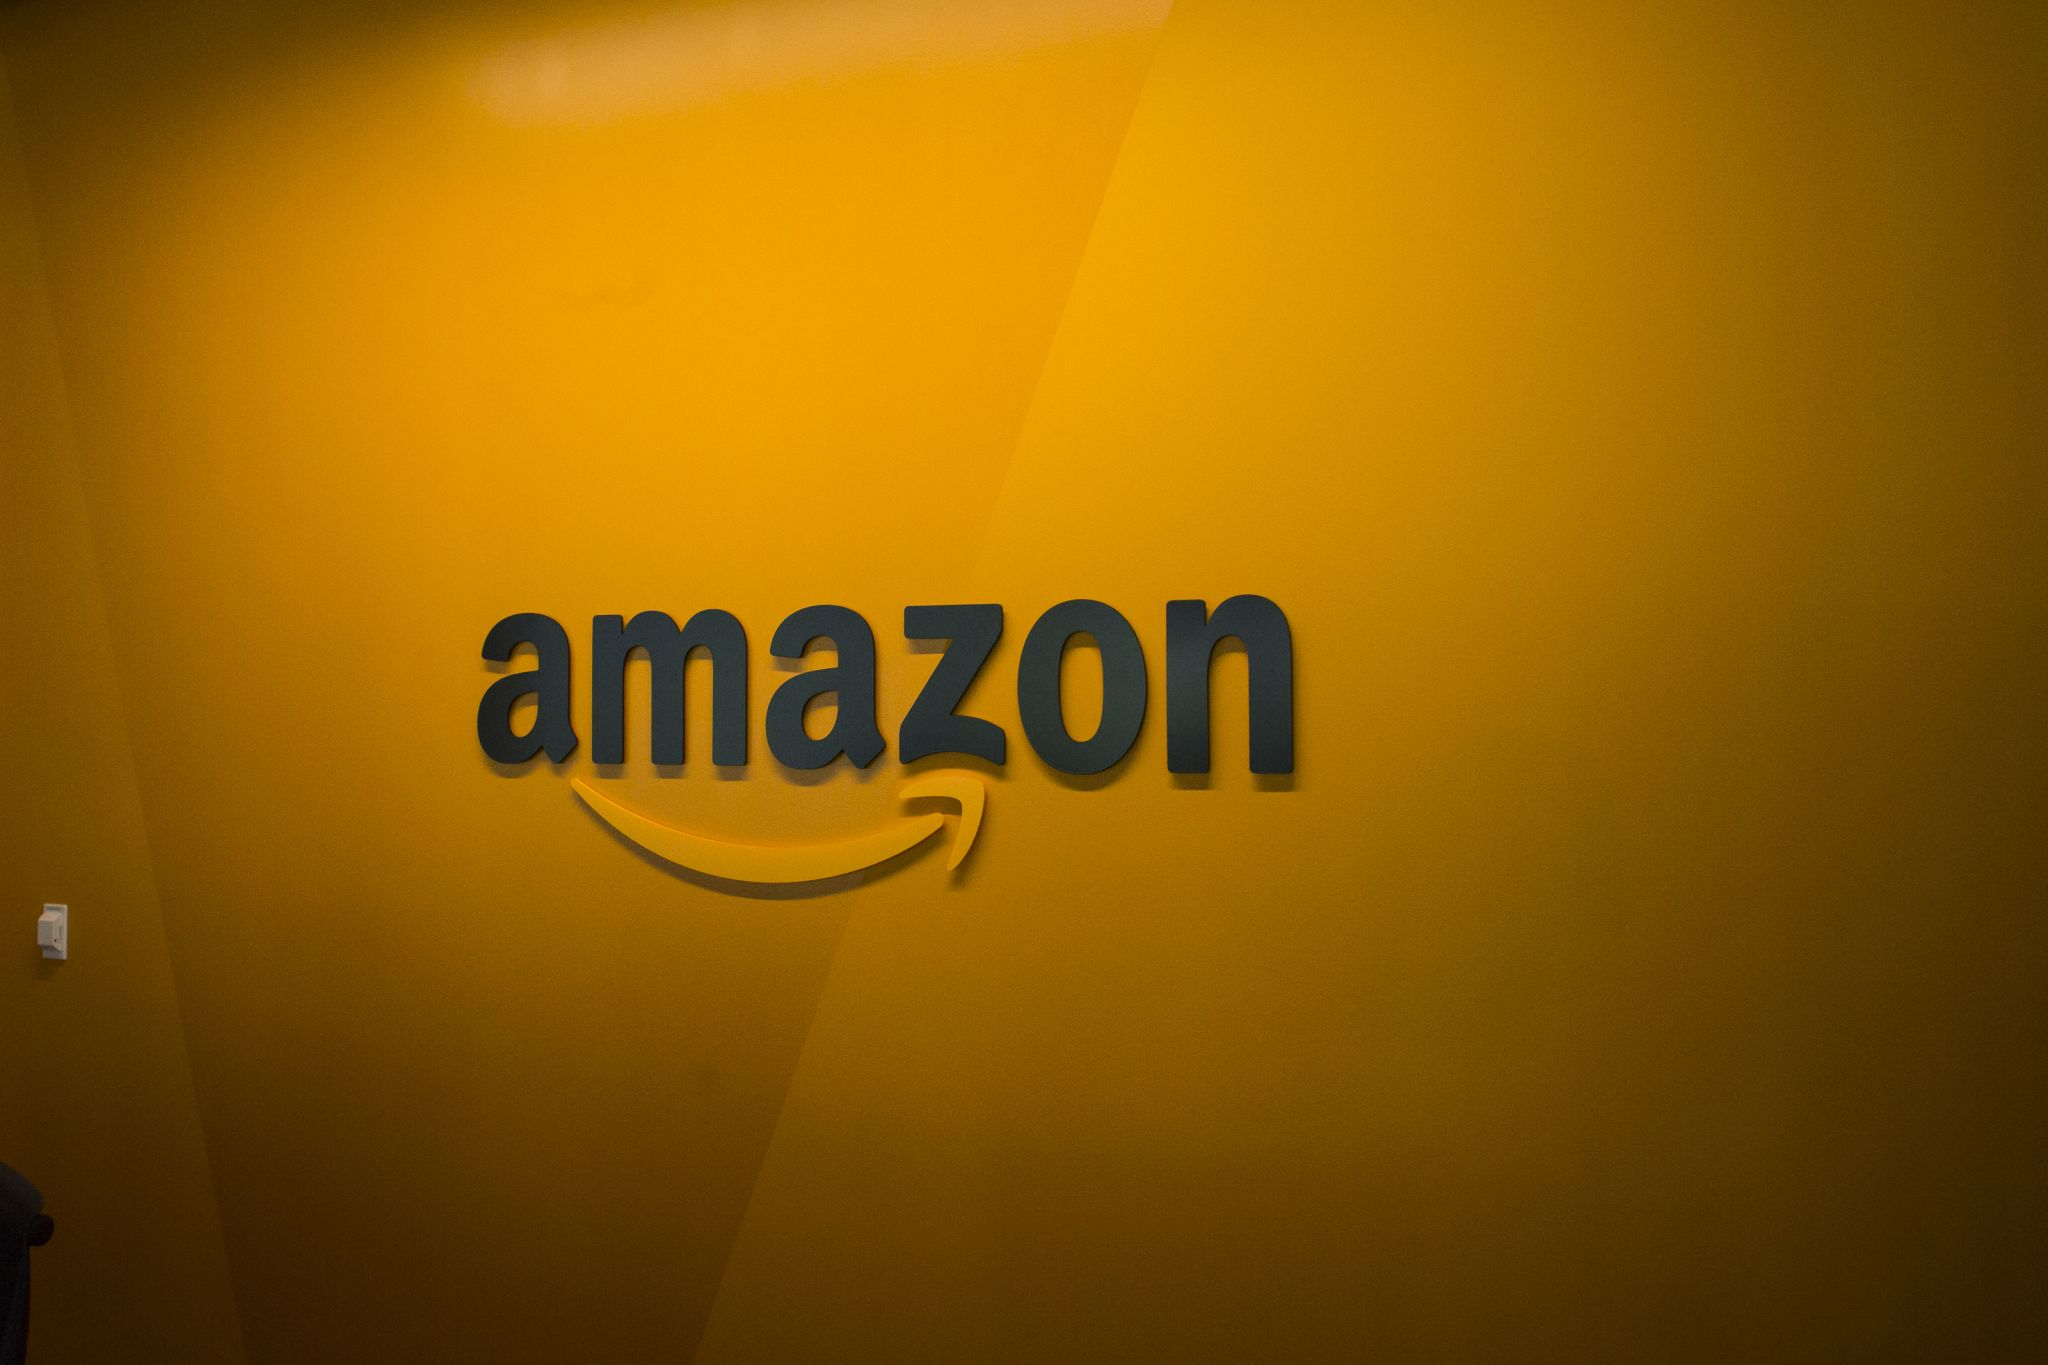 Amazon launches Black Friday 23 days before Black Friday